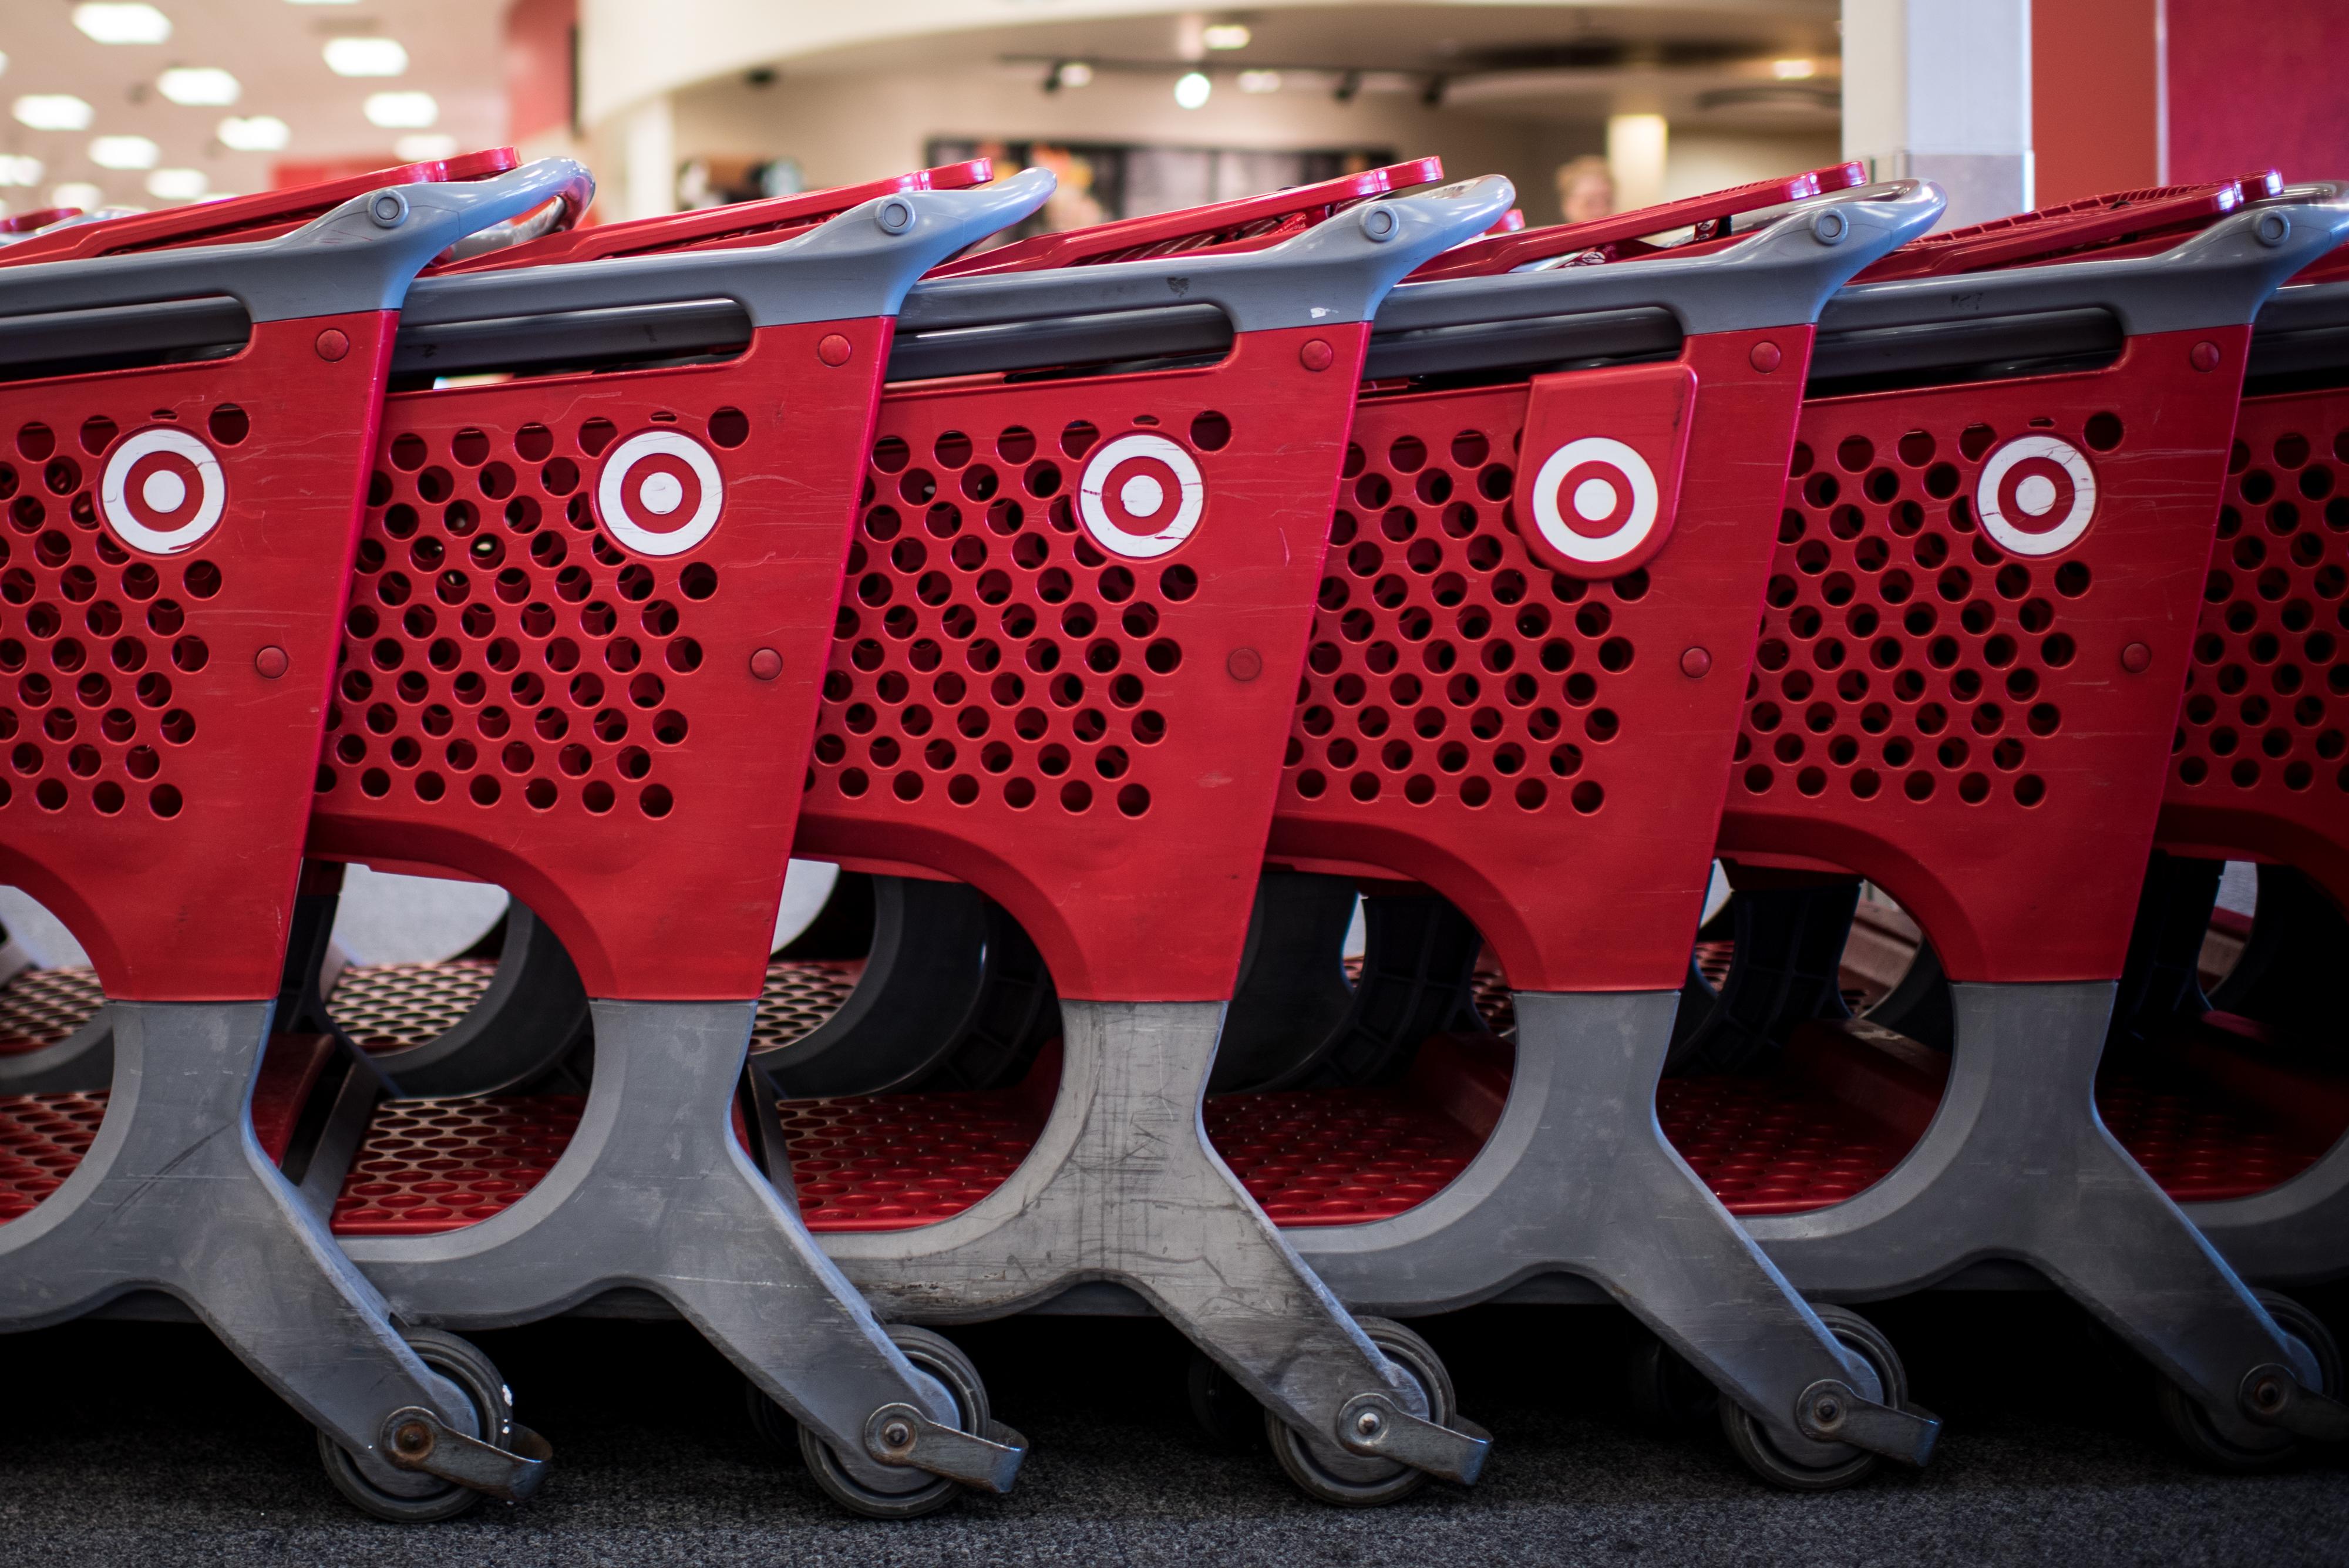 target-shopping-carts